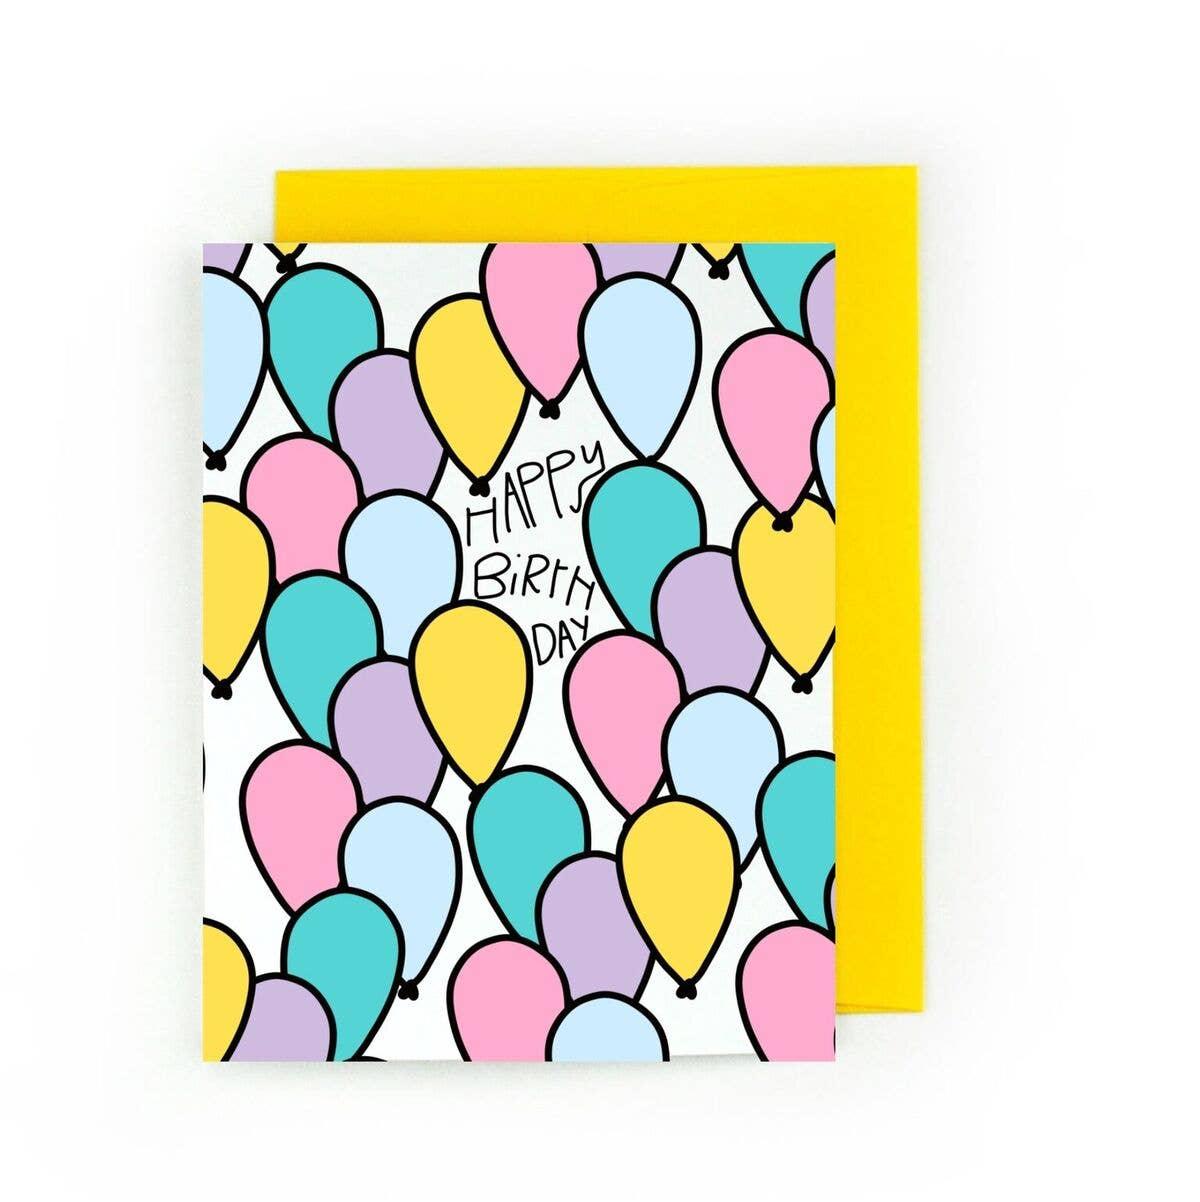 Crowded Birthday | Trada Marketplace